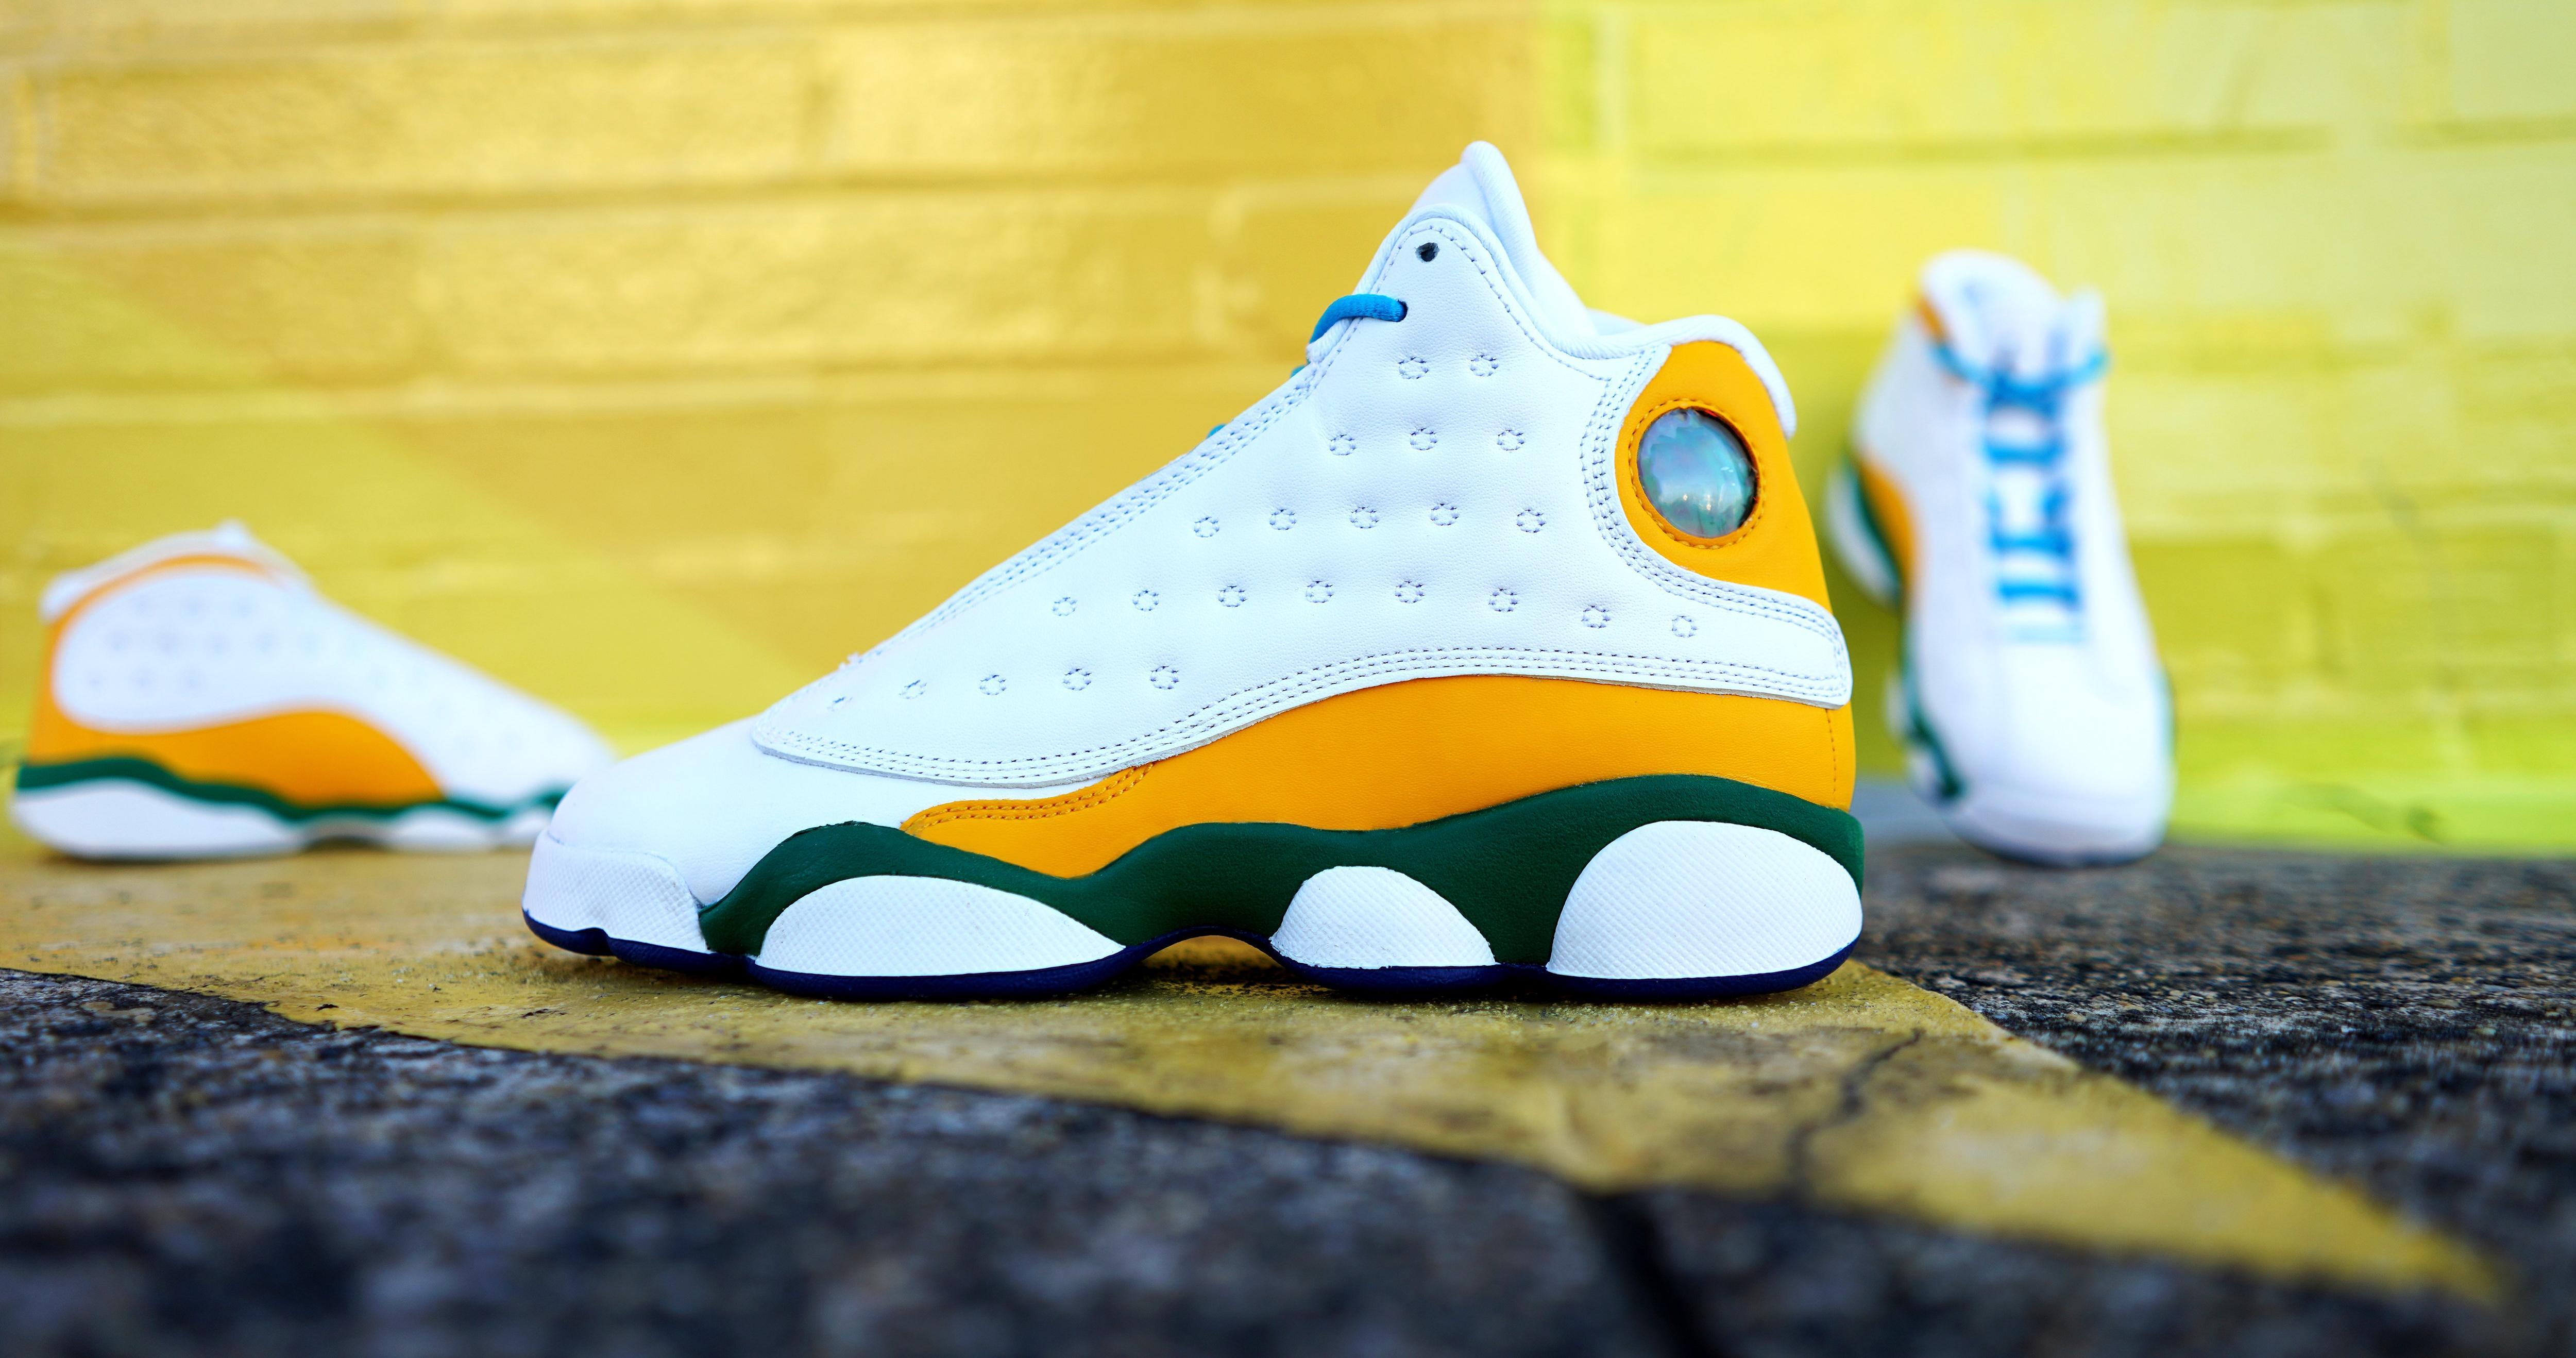 Sneakers Release Air Jordan Retro 13 Playground White Black